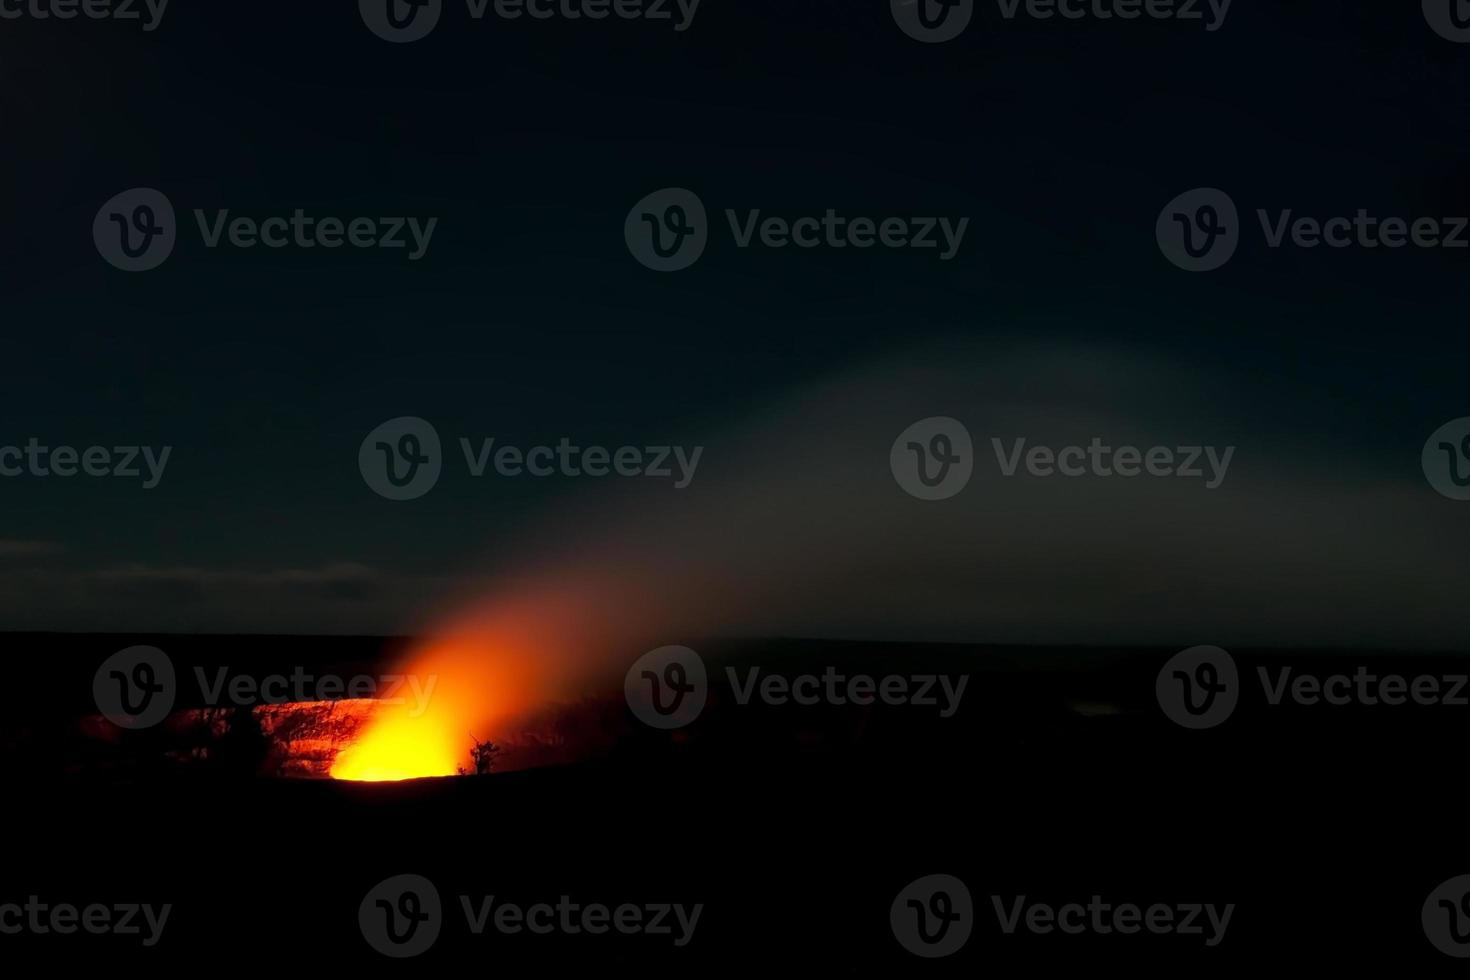 cratere fumante del vulcano Hilamaumau Kilauea nei vulcani delle Hawaii foto